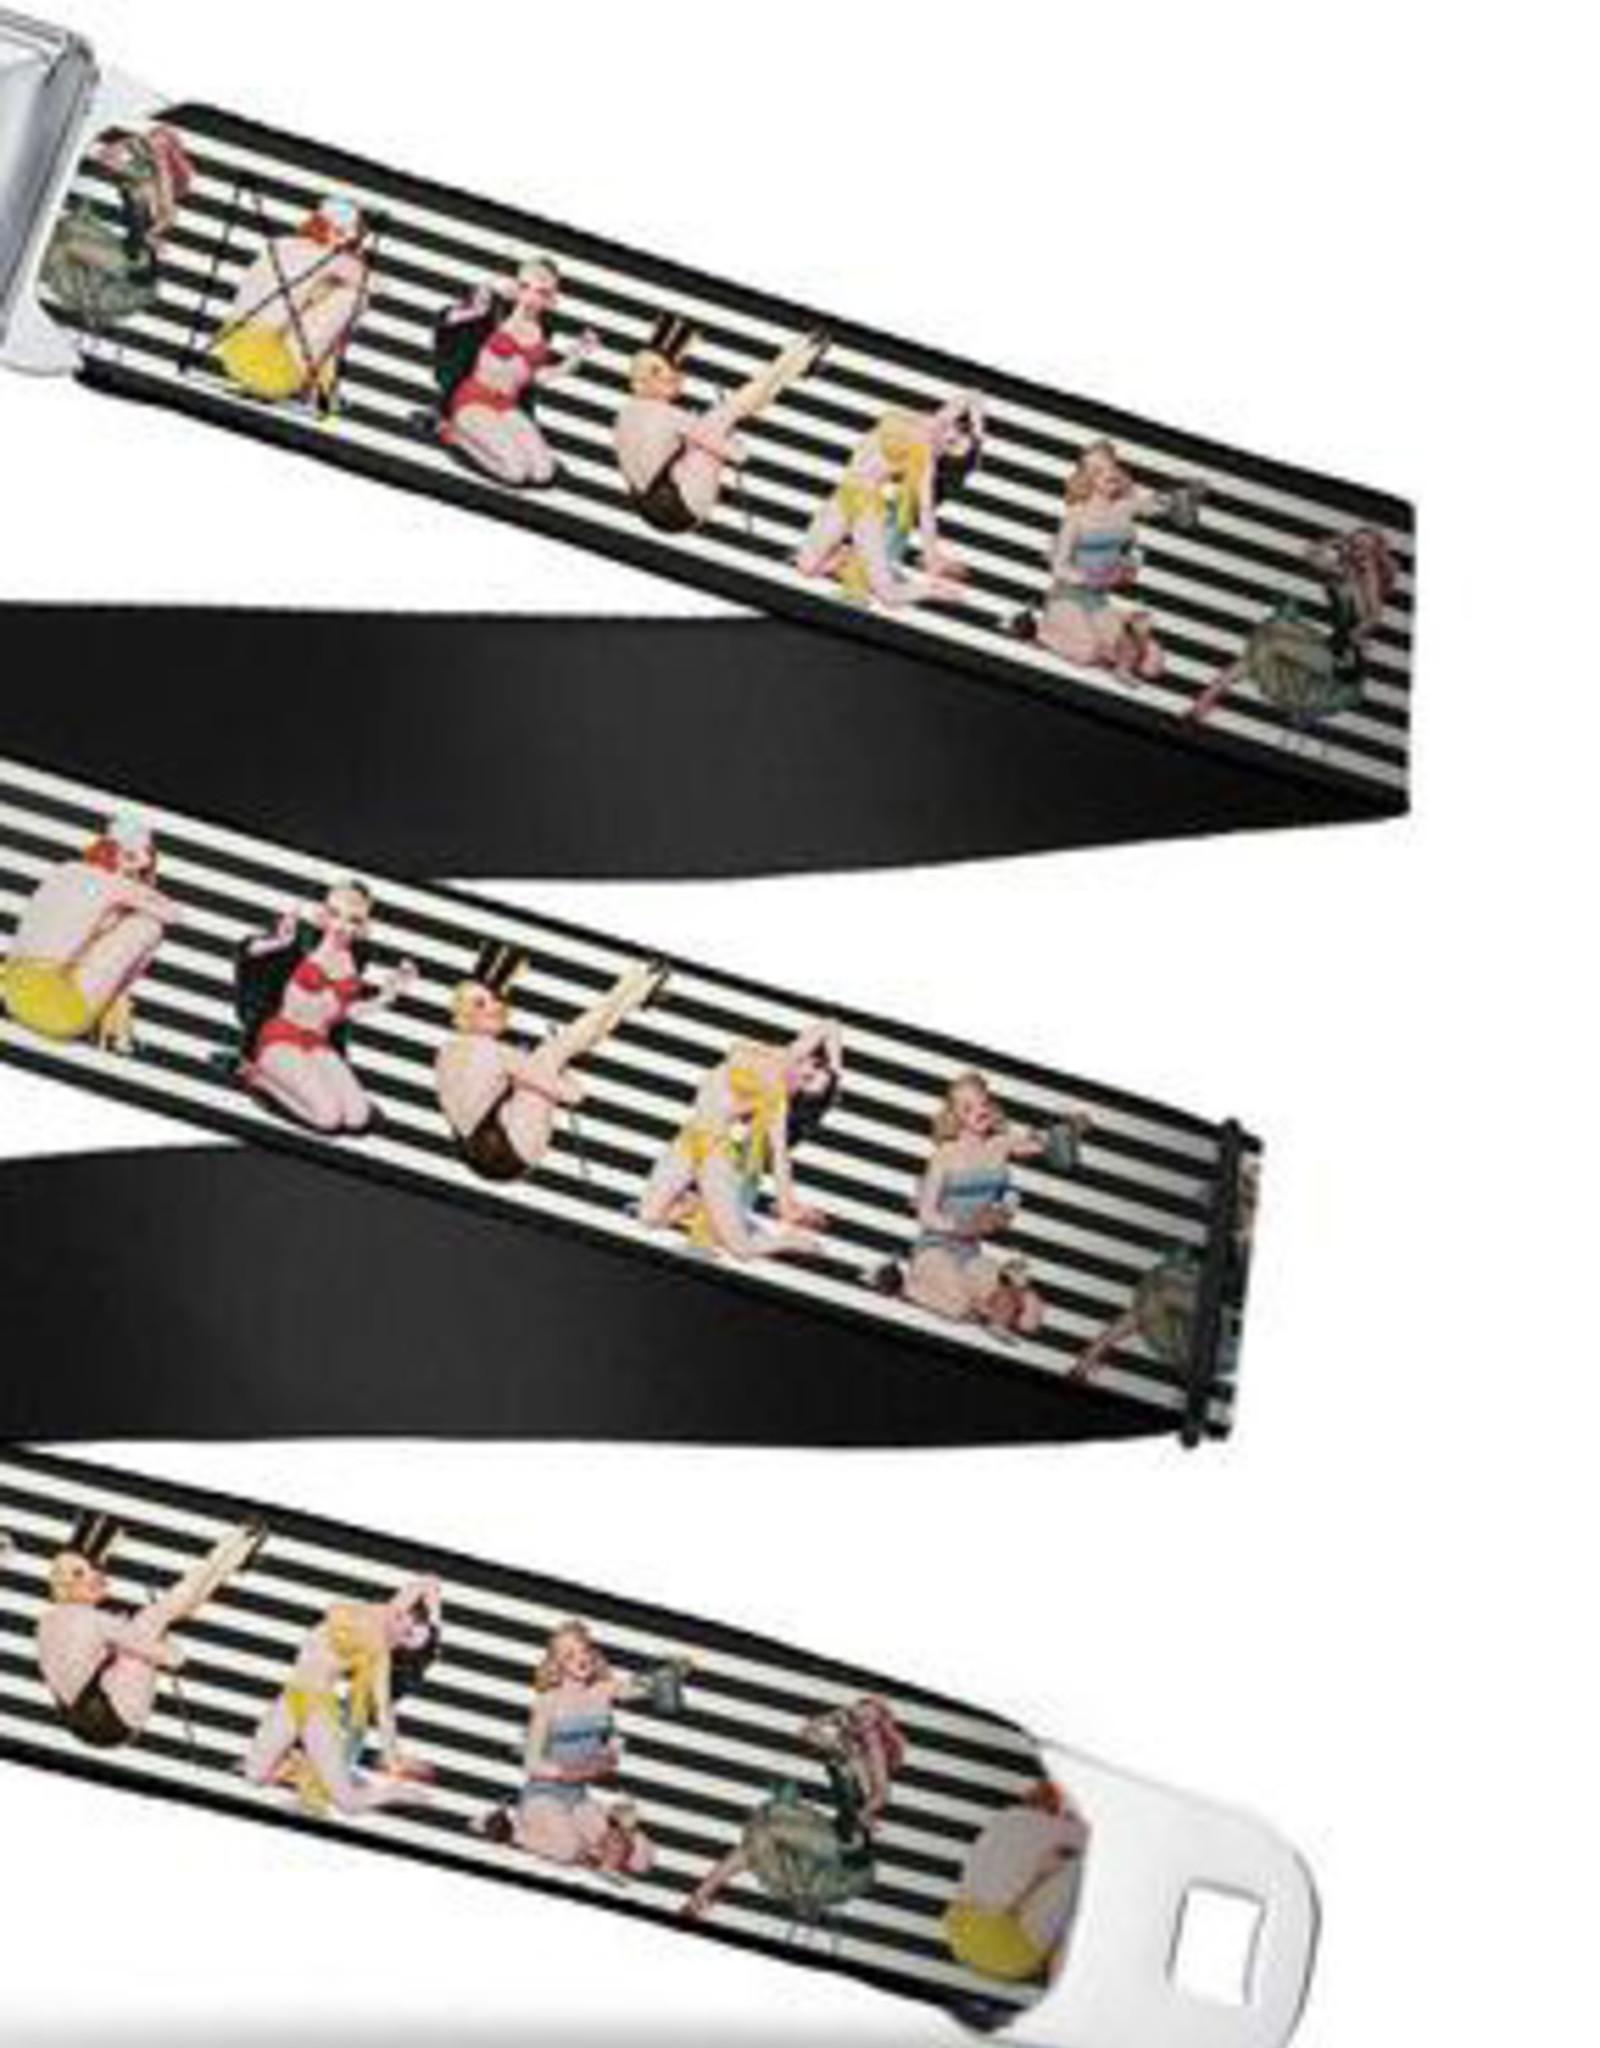 Buckle Down Belts Starburst Seatbelt Belt - Pin Up Girl Poses Stripe Black/White Webbing